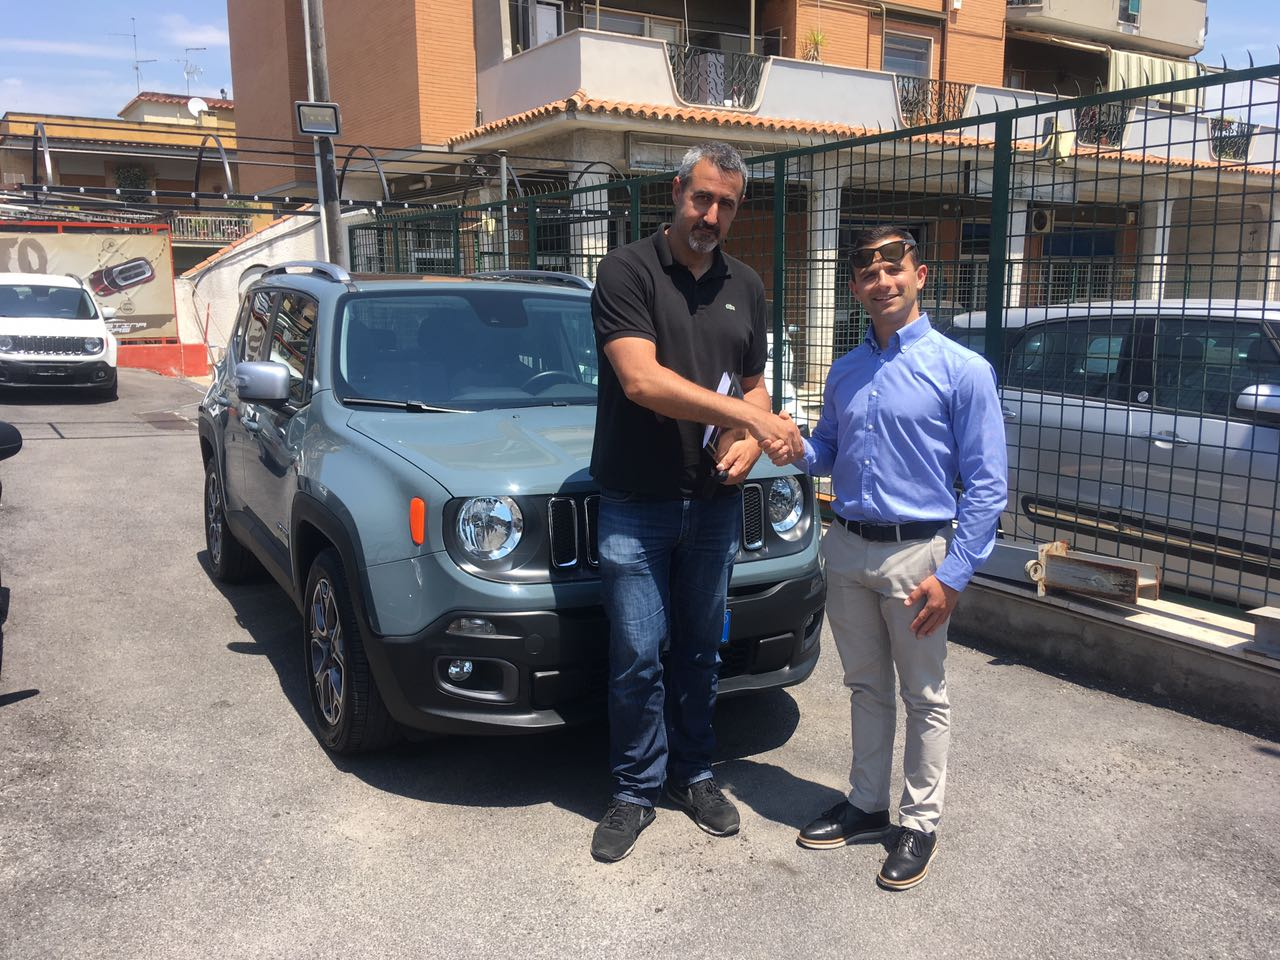 Auguri Eddy Per La Tua Nuova Auto Prenestina Motors